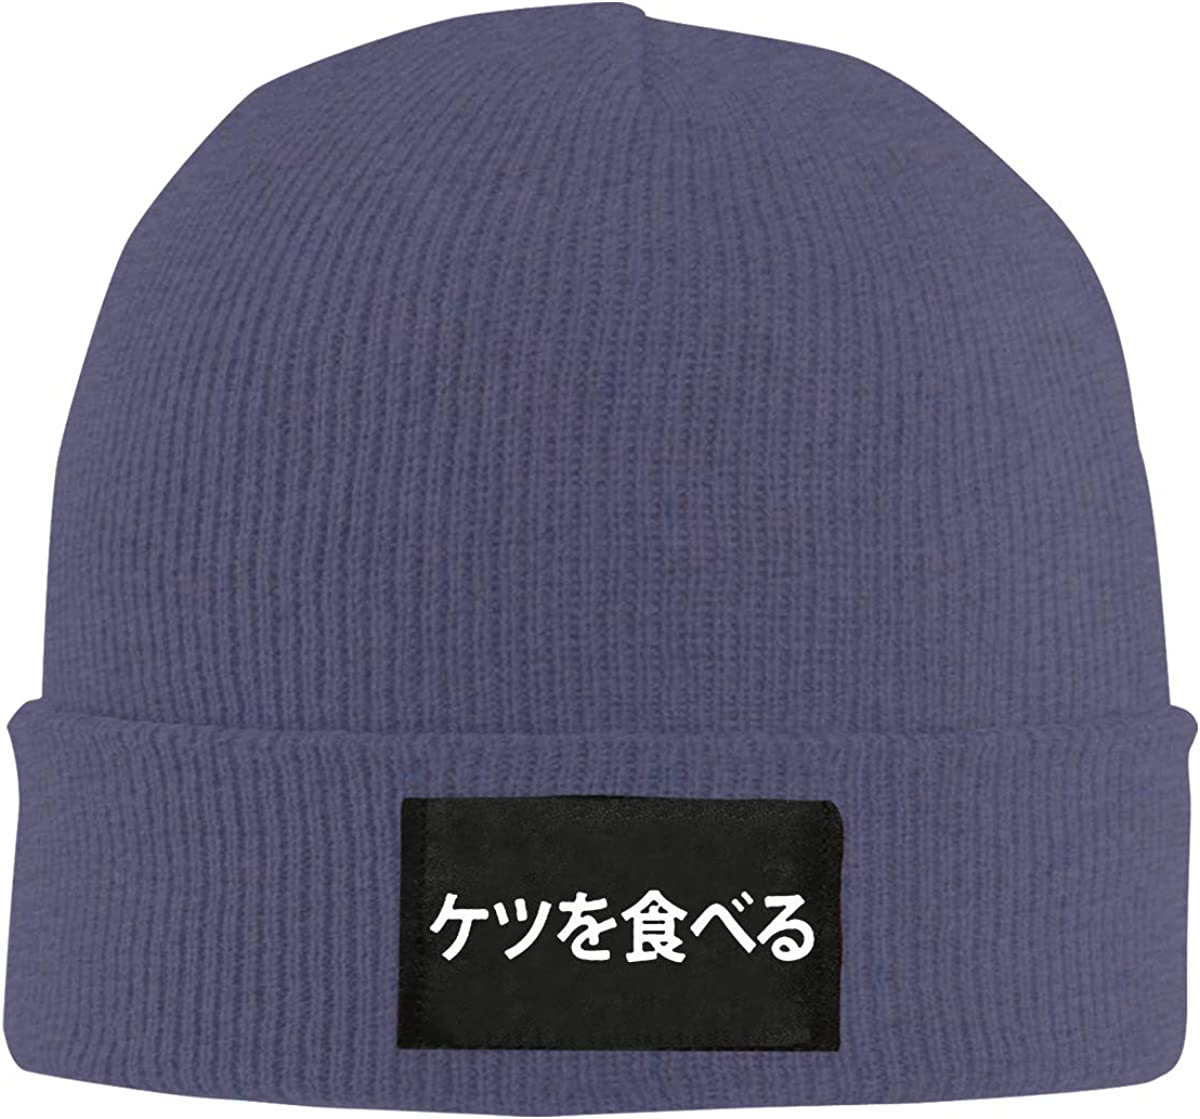 Japanese I Eat Ass Unisex Warm Winter Hat Knit Beanie Skull Cap Cuff Beanie Hat Winter Hats